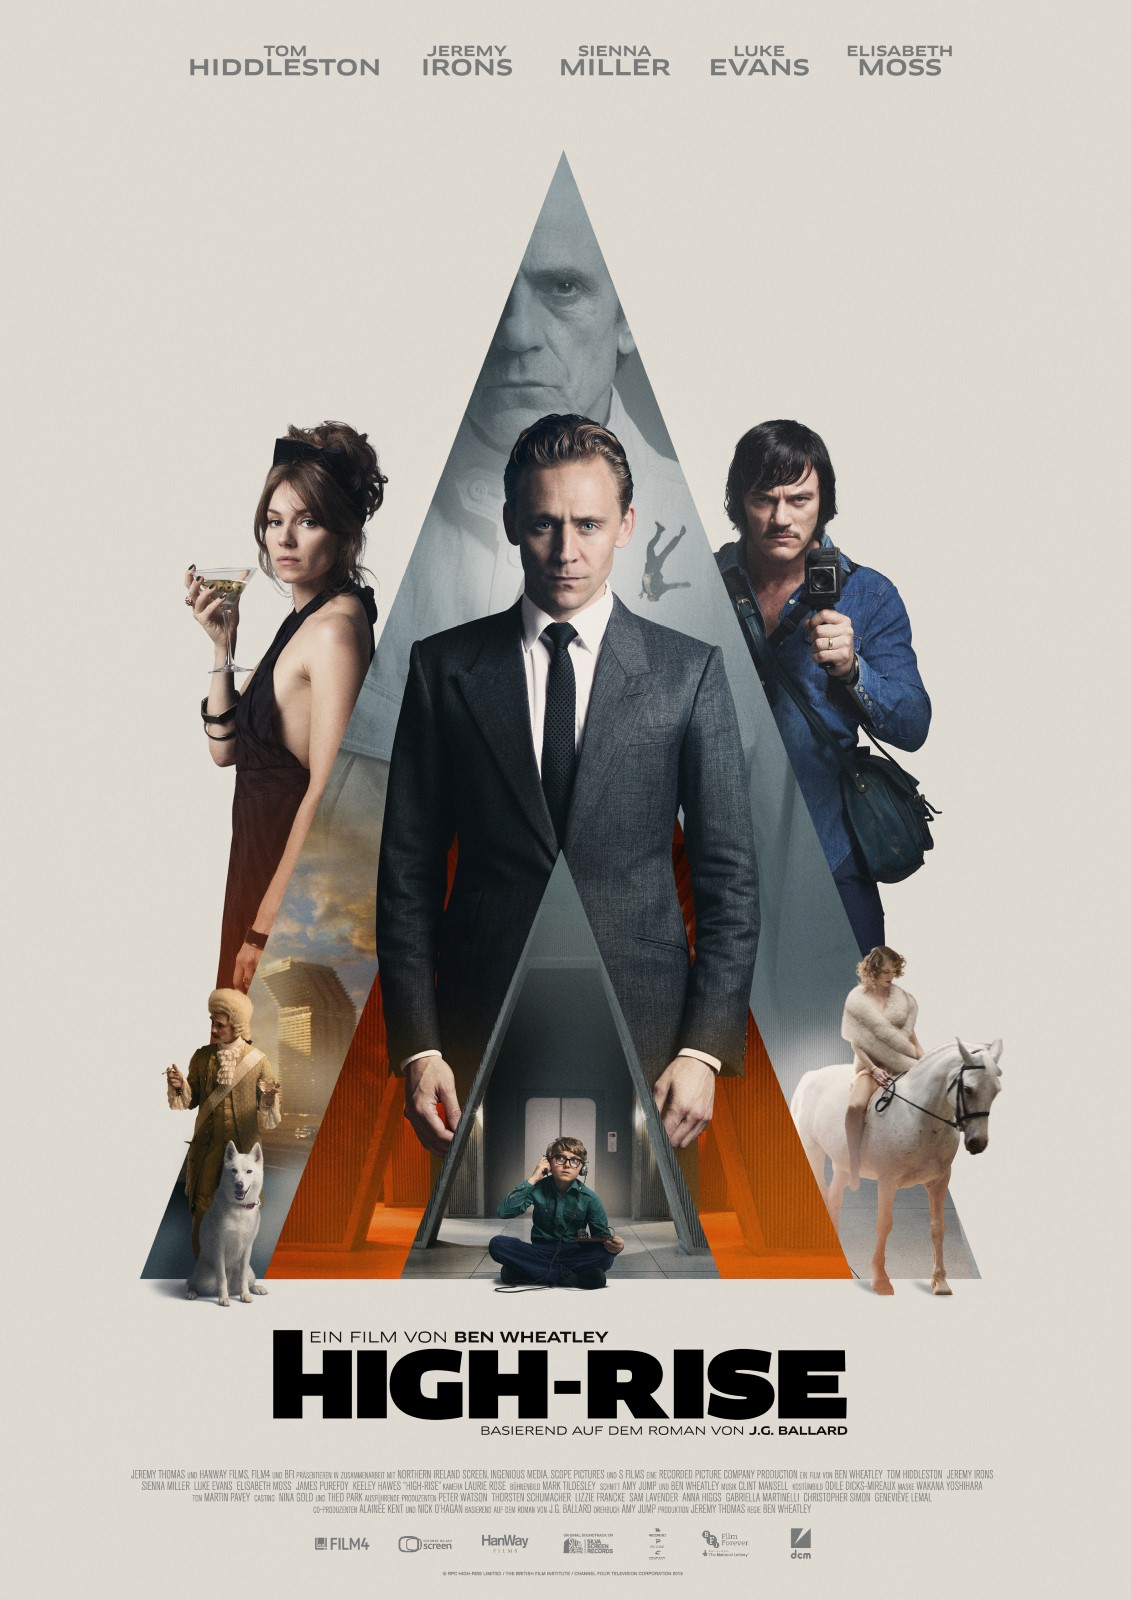 High-Rise Film